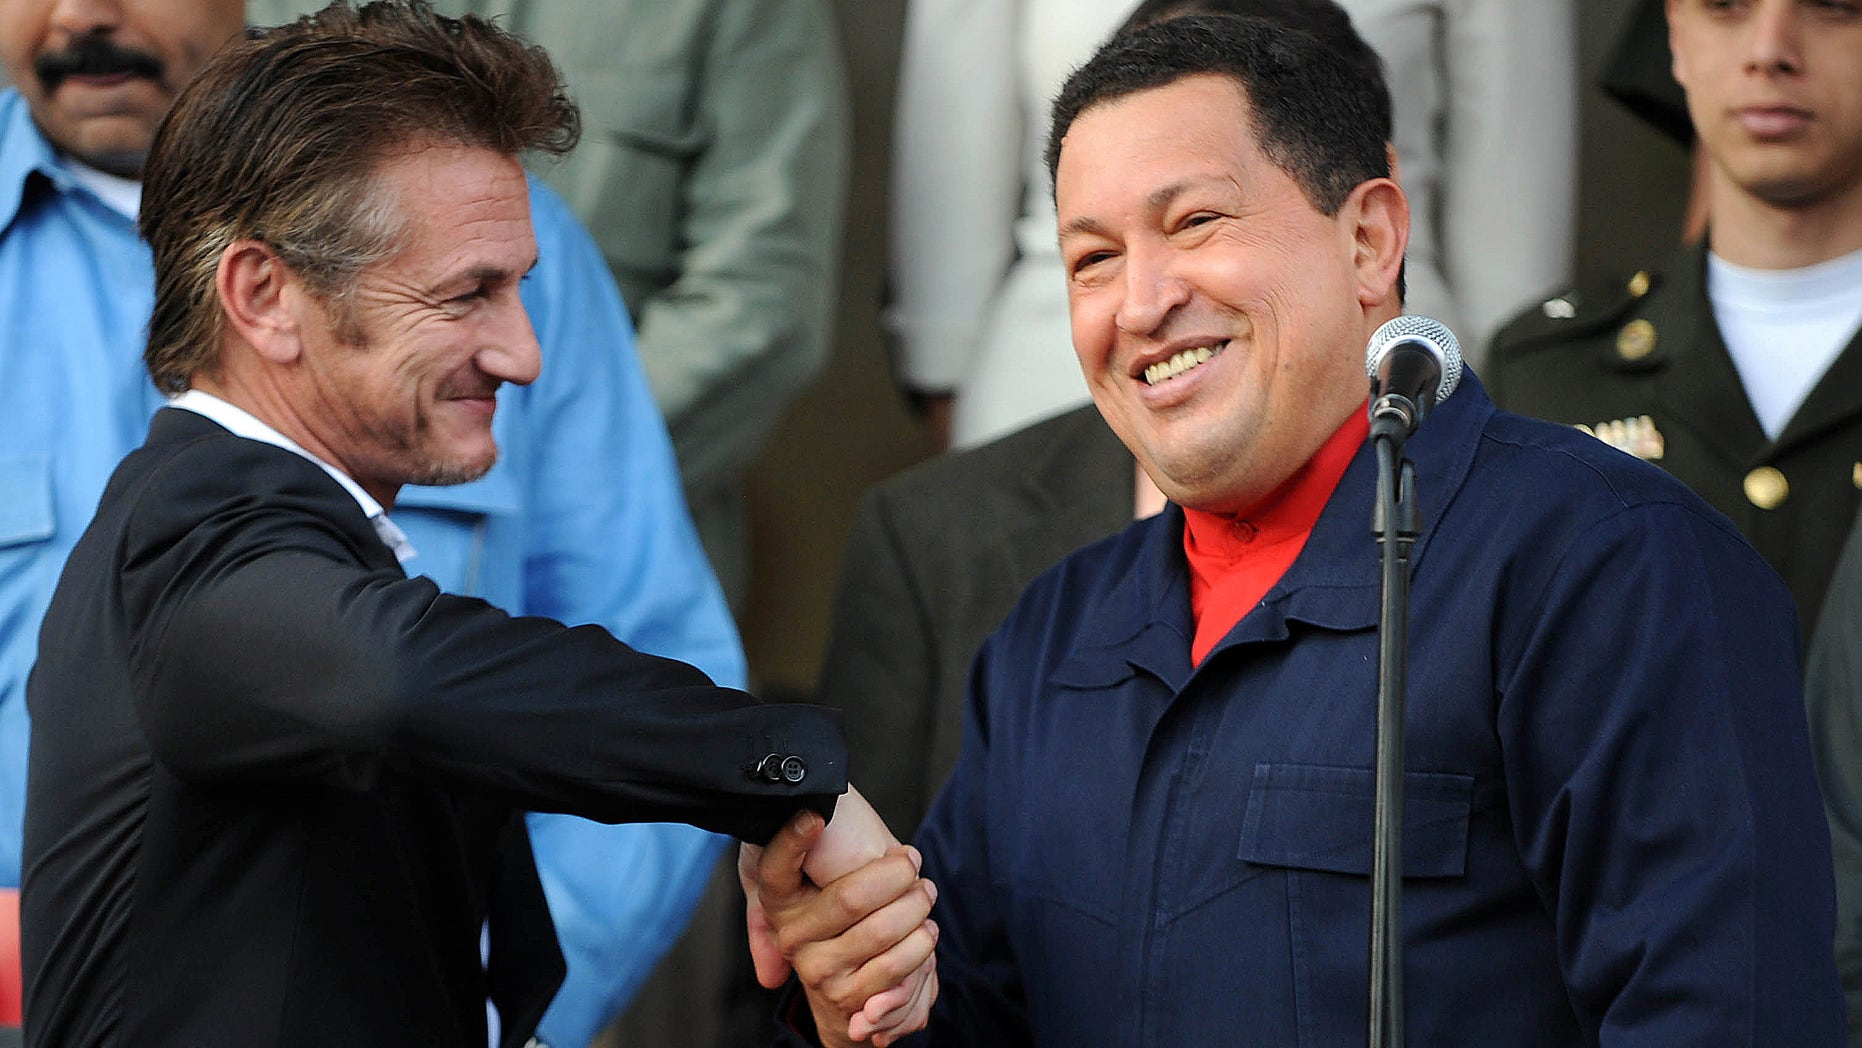 Late Venezuelan President Hugo Chavez and Sean Penn in Caracas on March 5, 2011.